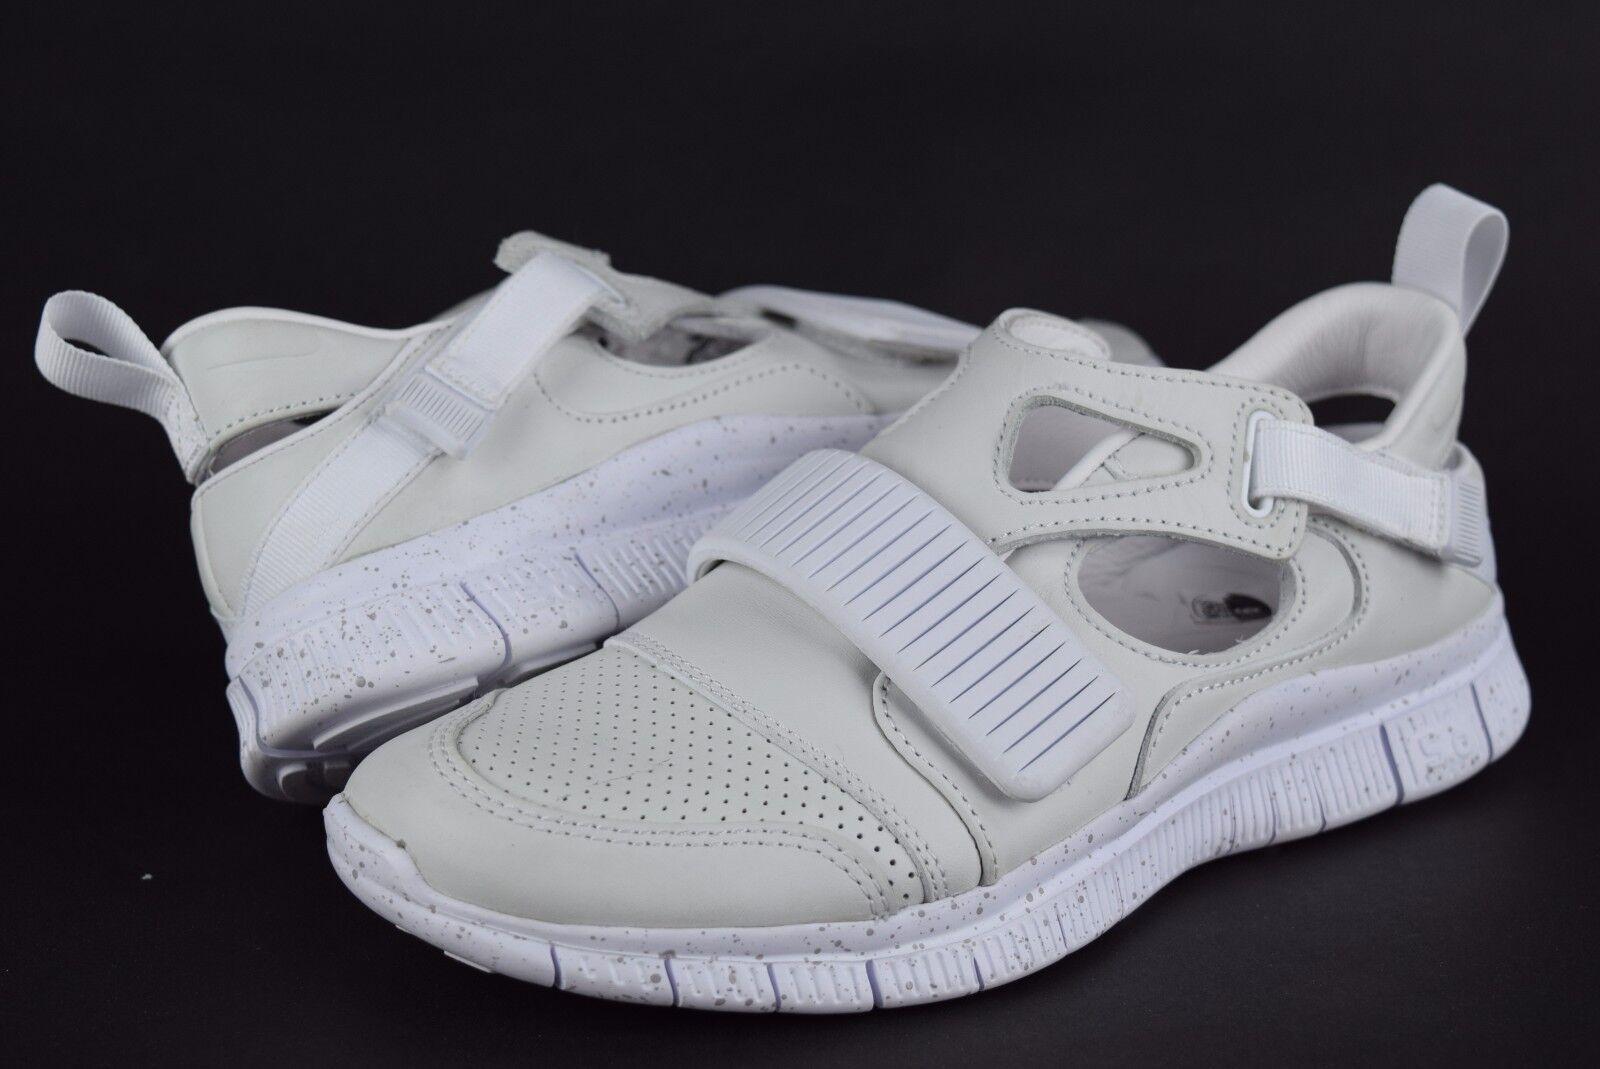 NWOB Mens NikeLab Free Huarache Carnivore SP 801759 110 sz 6 6 sz white sneakers 7a7f70